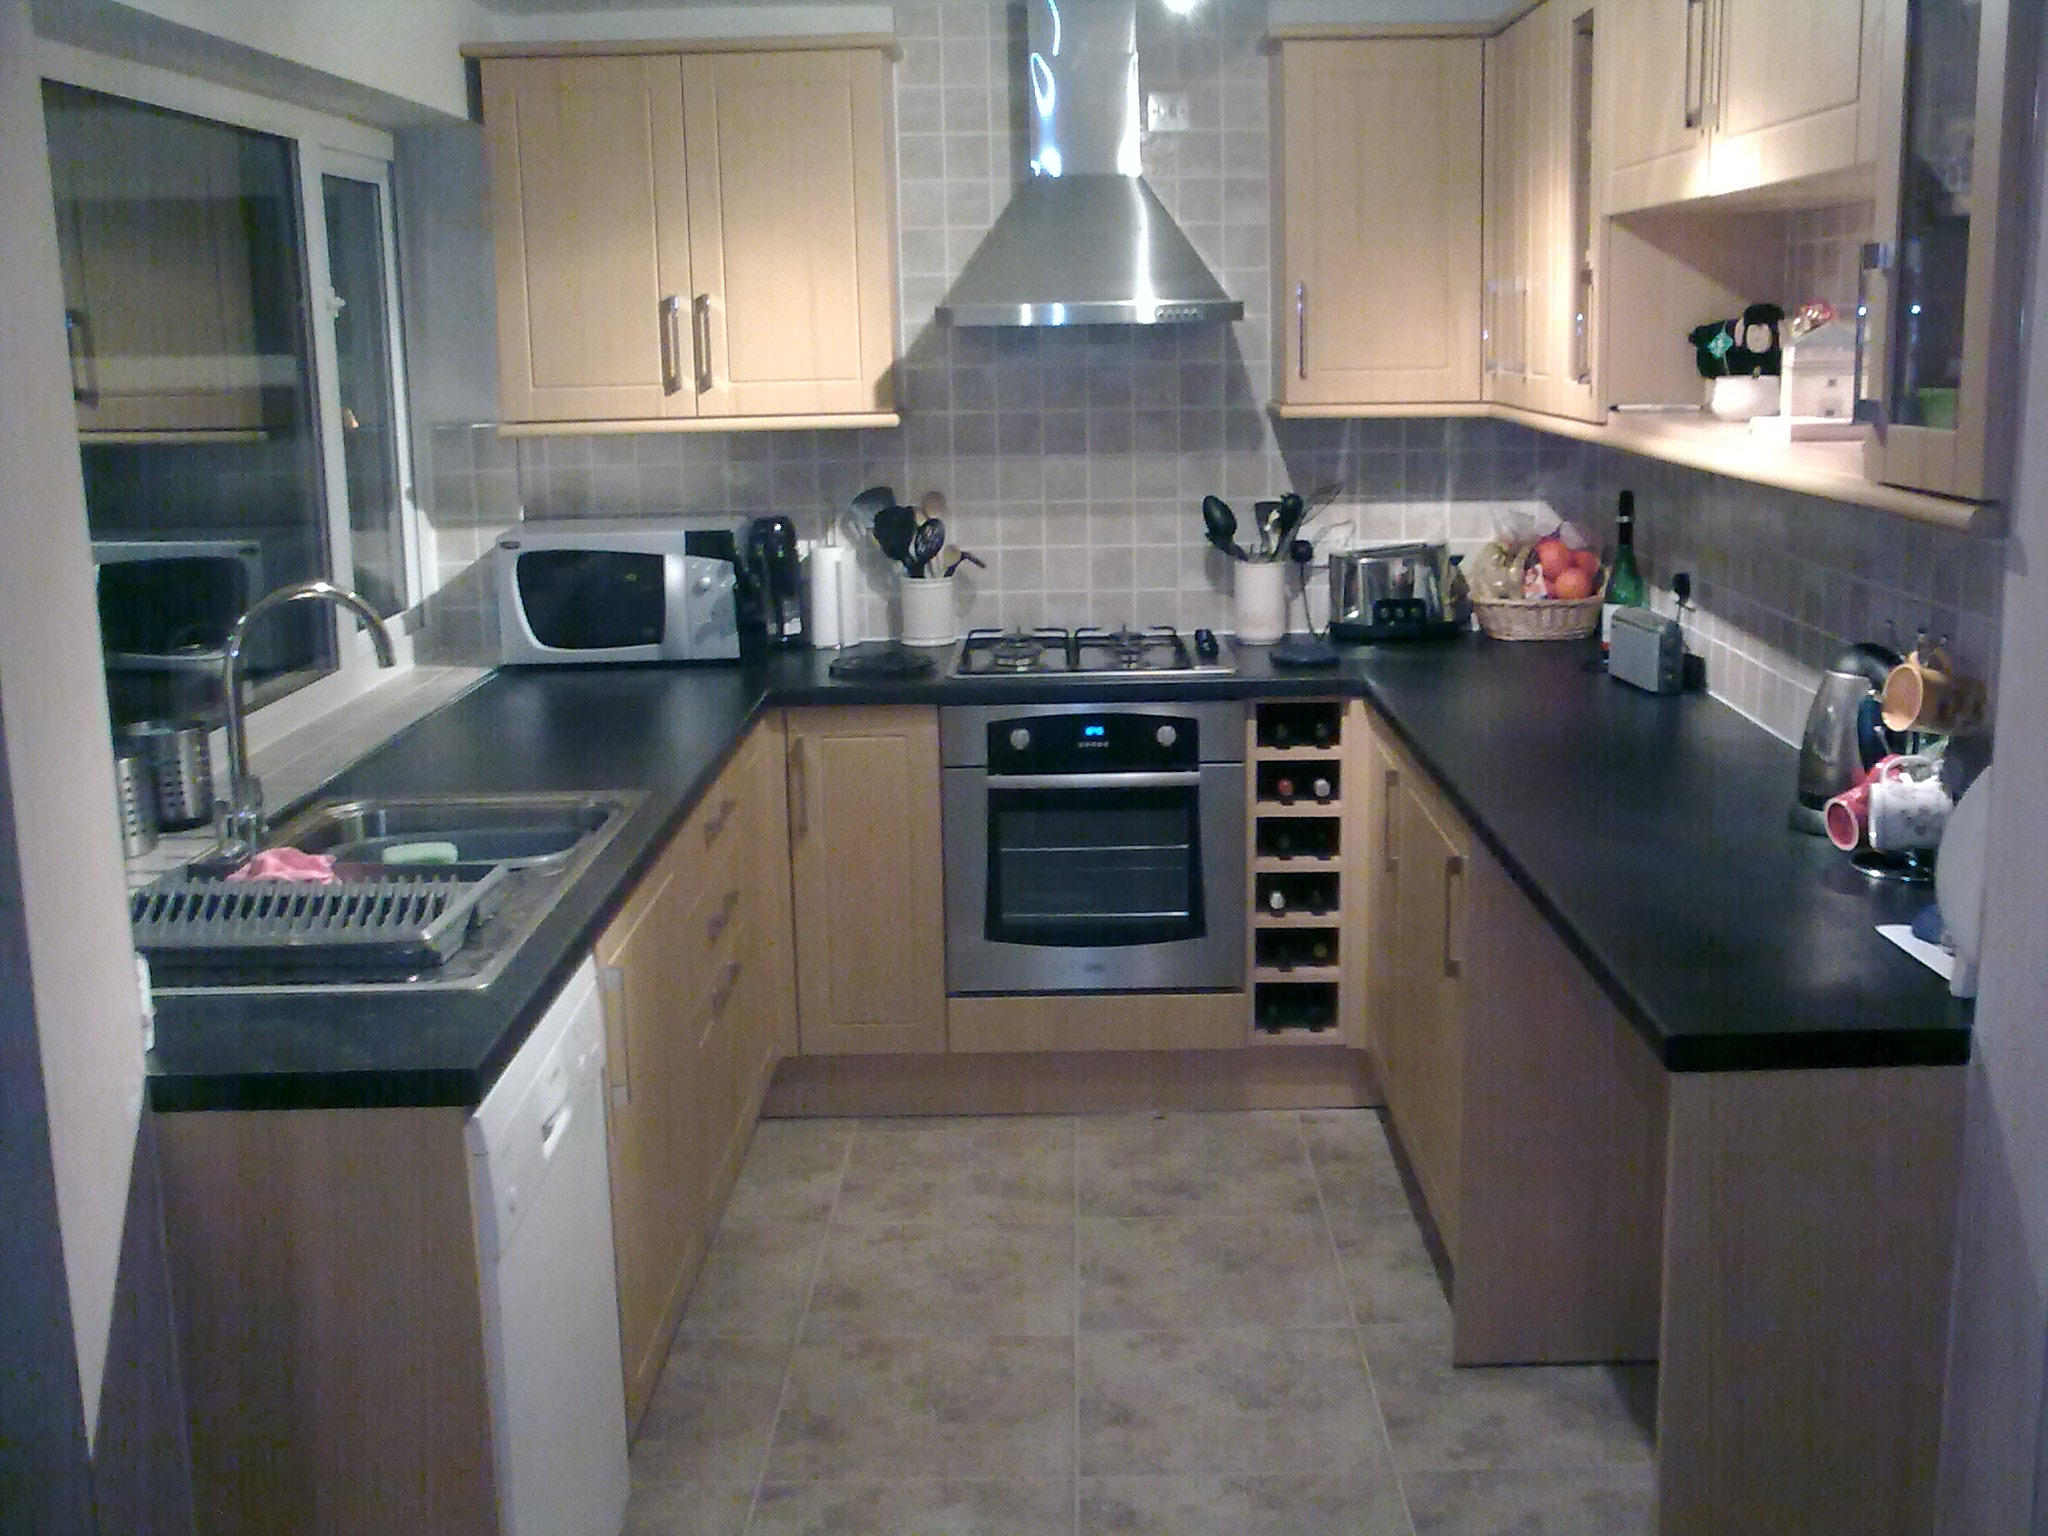 مطبخ صغير منظم